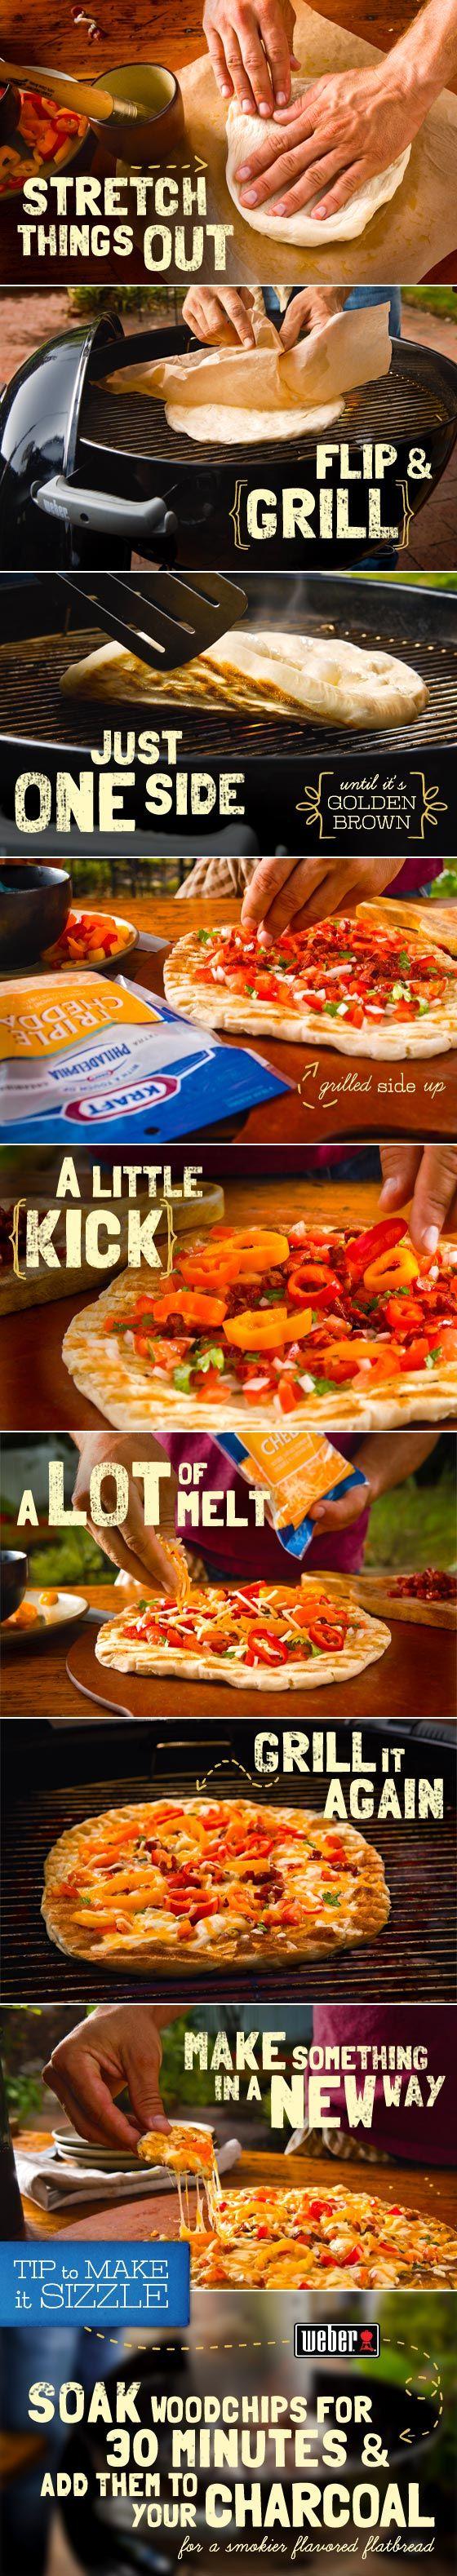 Yum summer grilling inspiration!